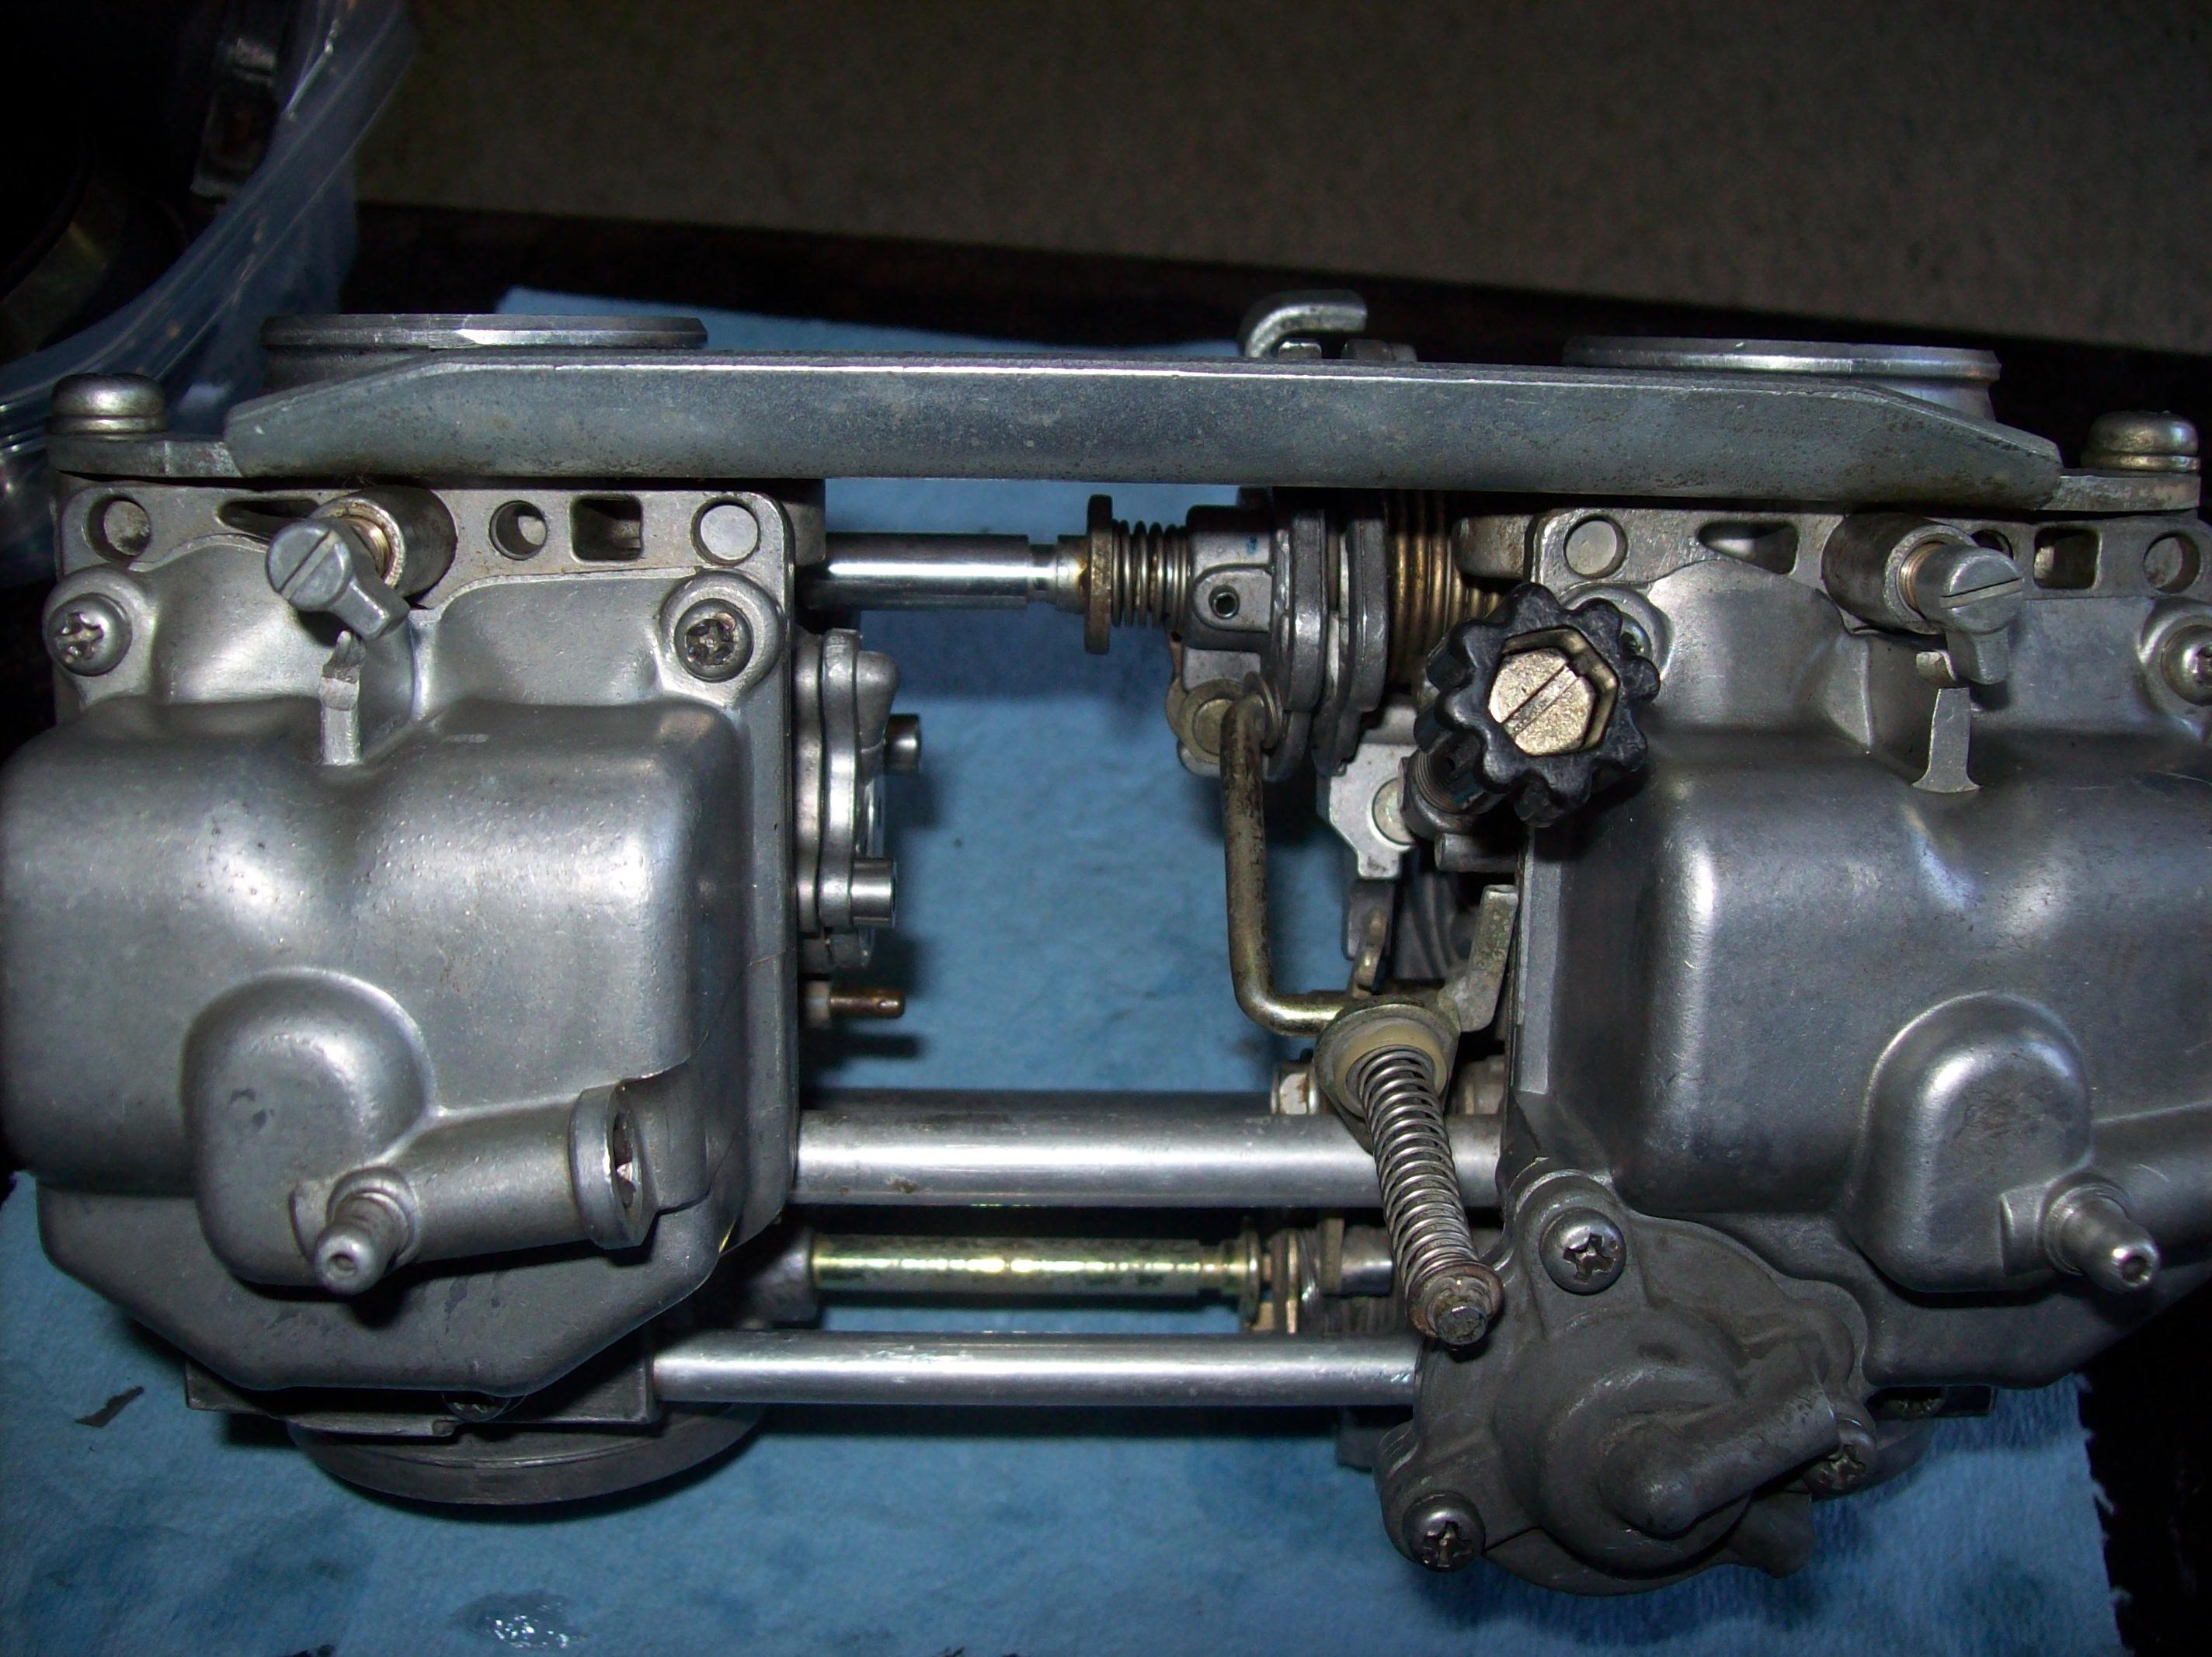 Rebuilding VB Carbs-201_4648.jpg